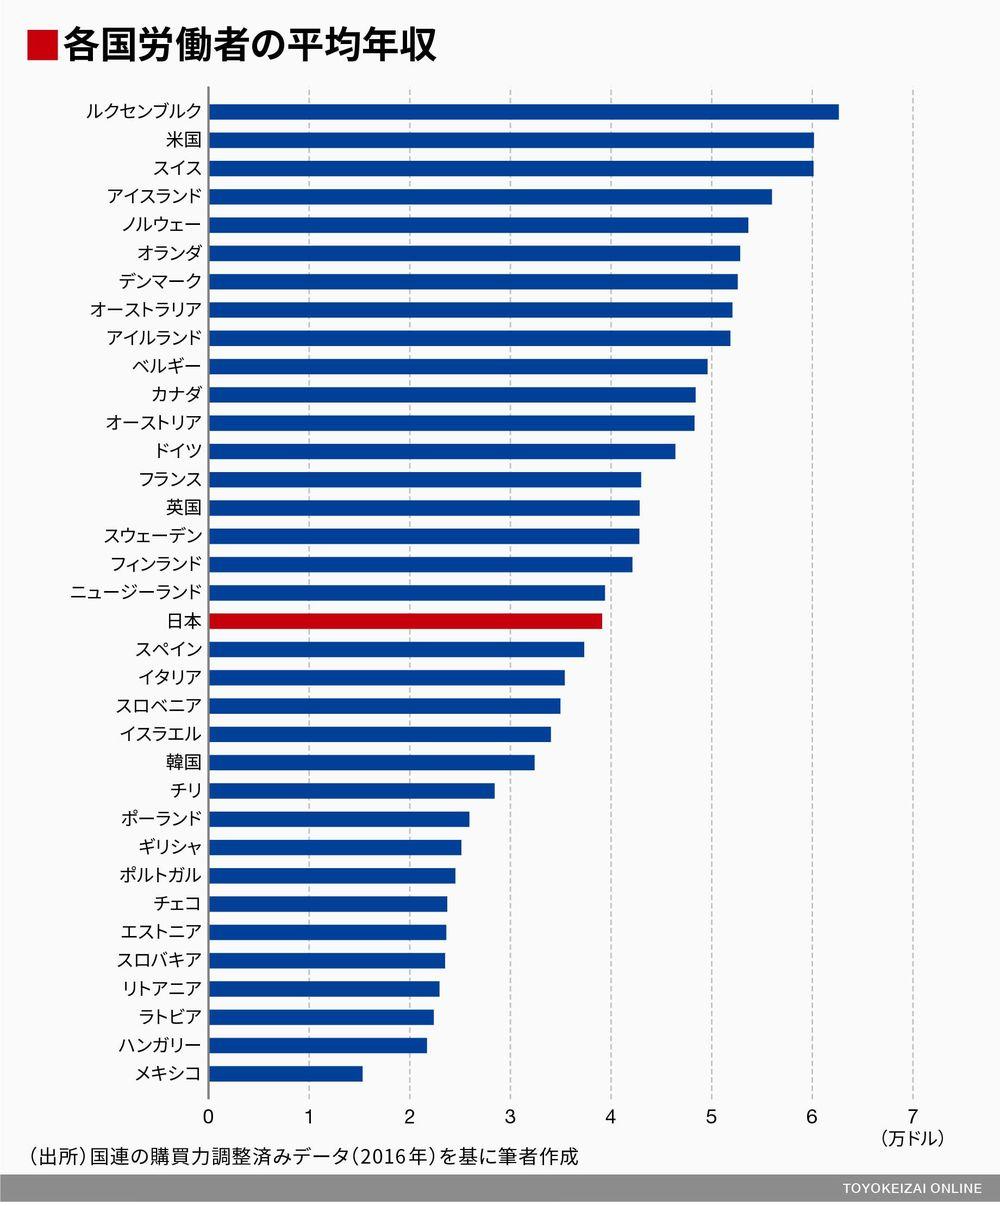 超格差社会 日本